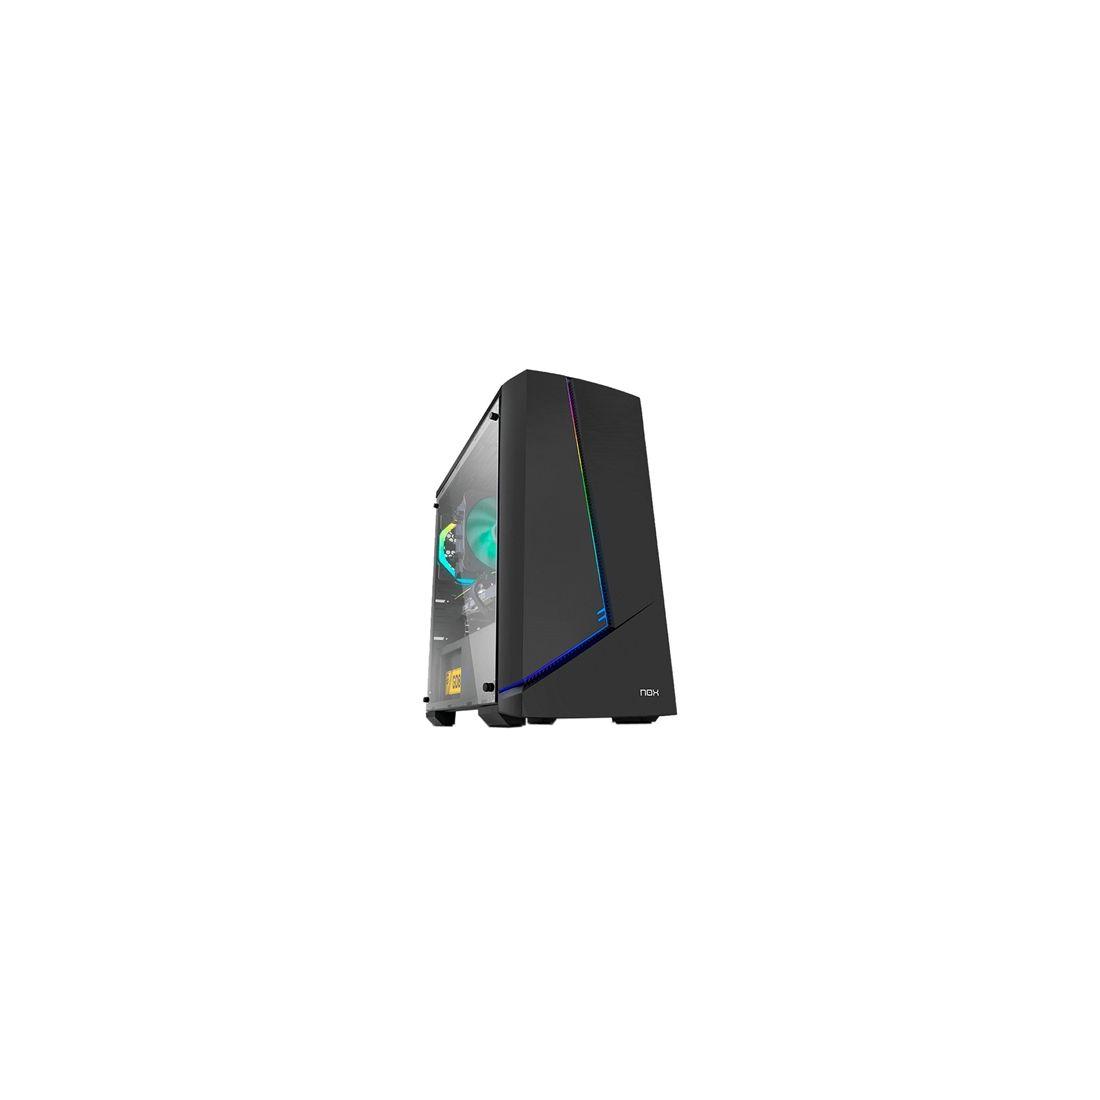 Nox Mini torre mATX Infinity ALPHA ARGB